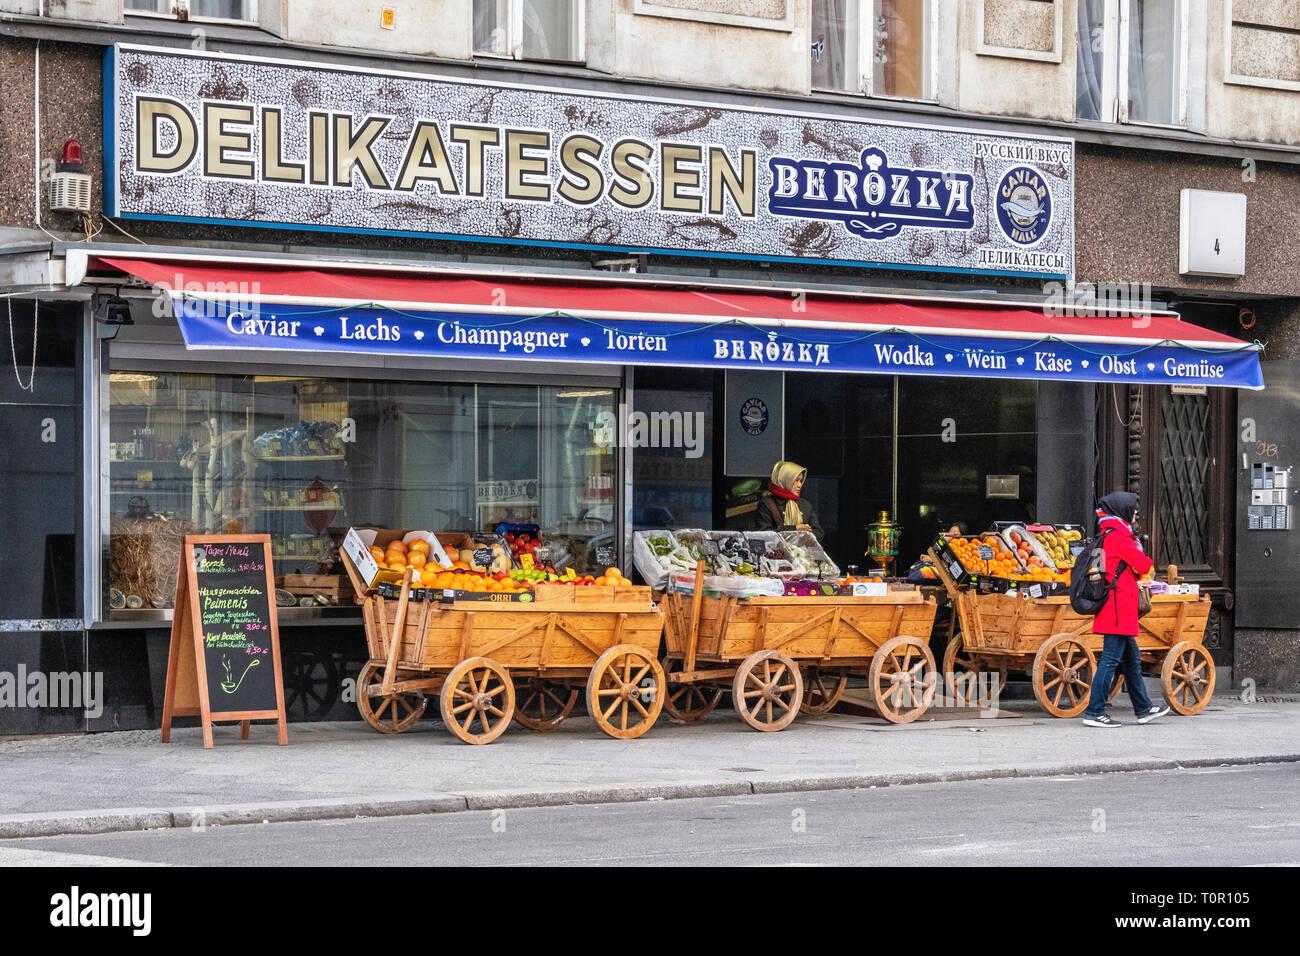 Delikatessen Berozka Russian delicatessan with fresh fruit and vegeatbles in wooden carts outside Deli - Berlin - Stock Image